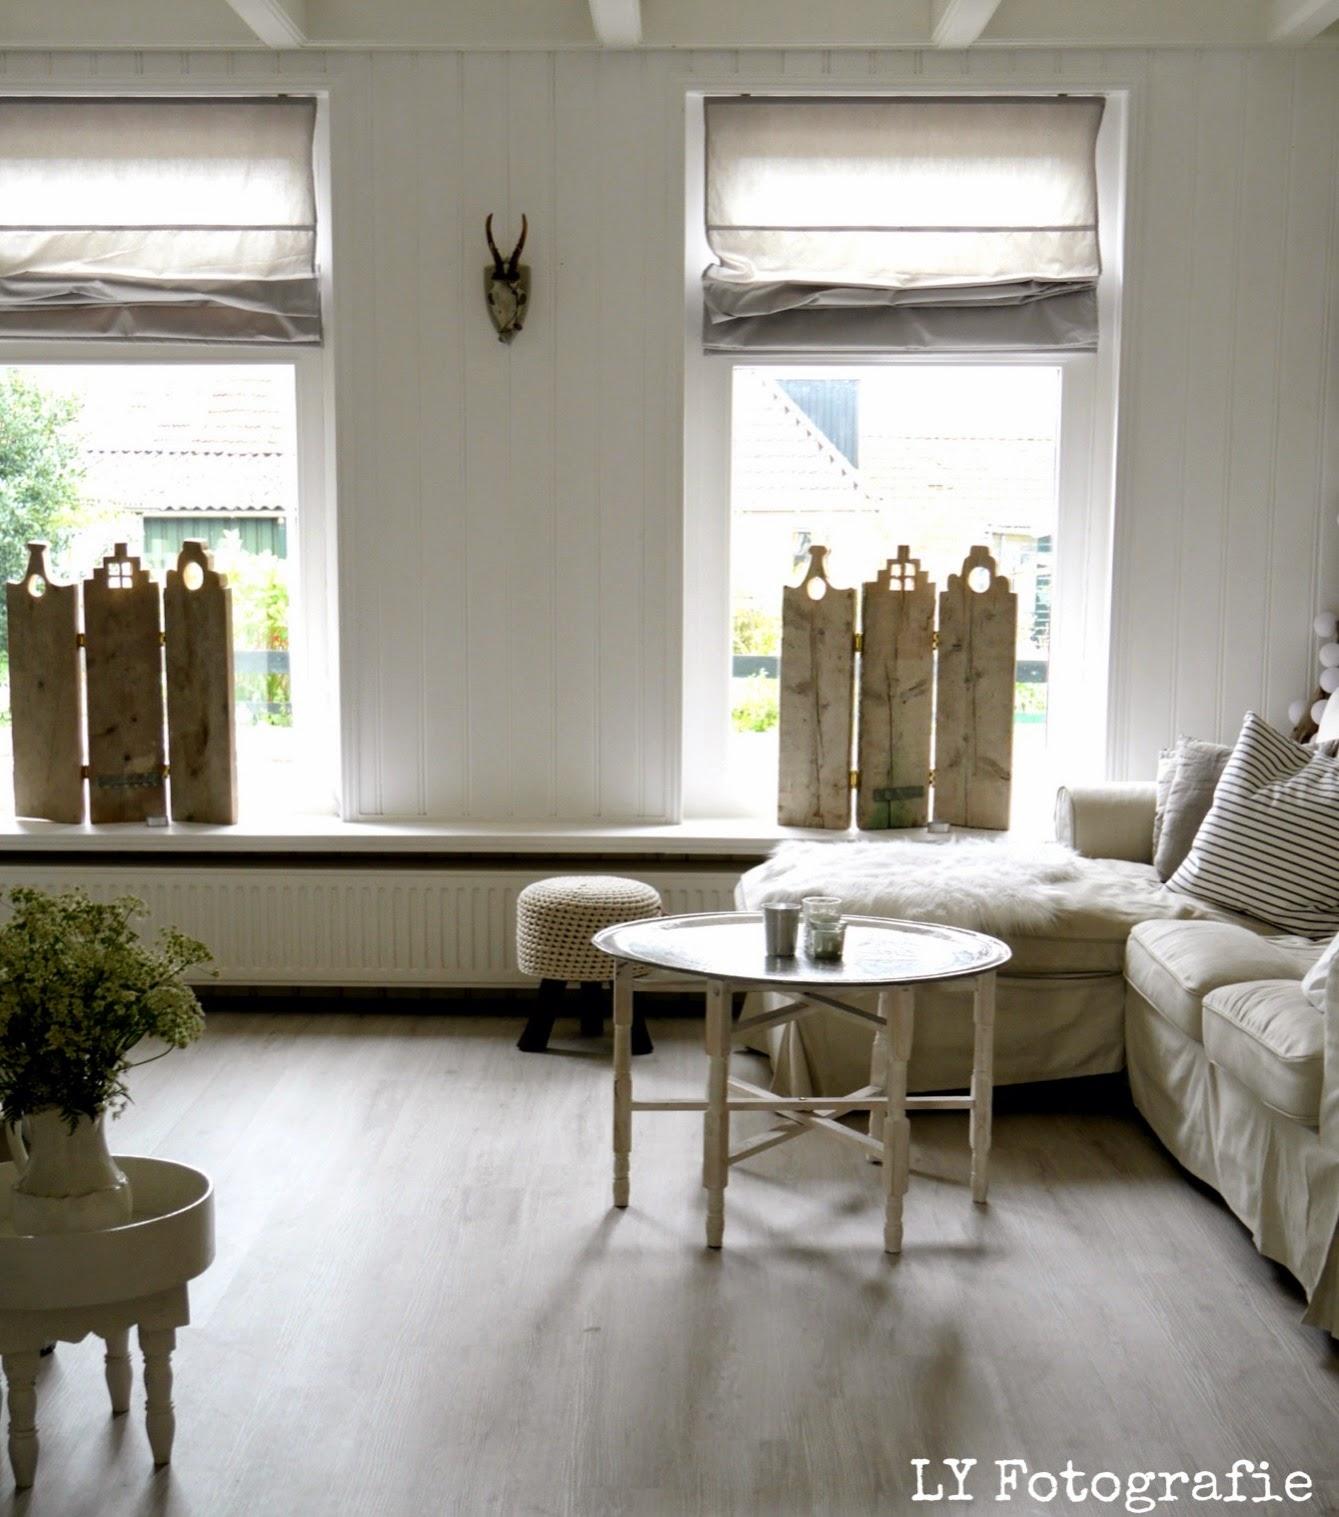 Vensterbank decoratie groot raam for Decoratie vensterbank woonkamer